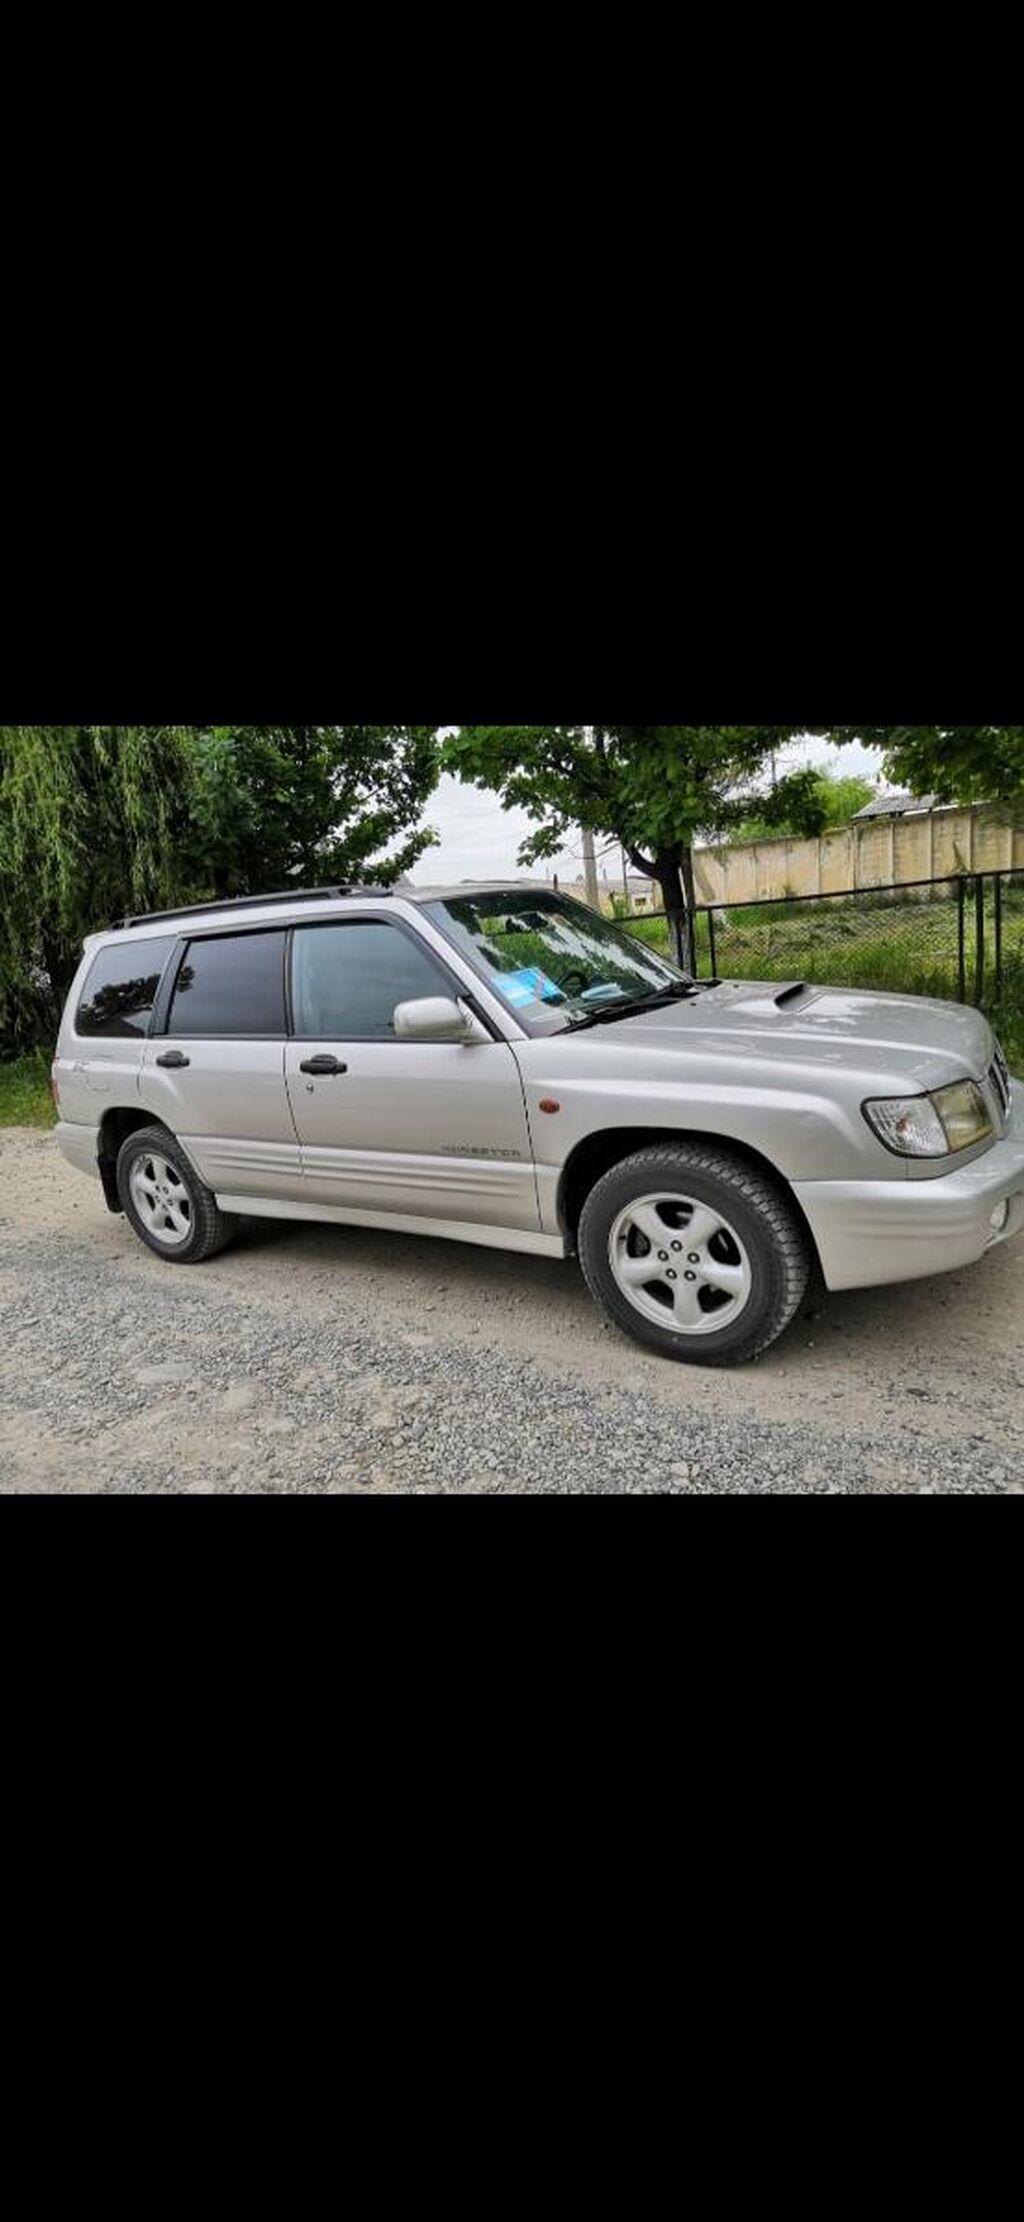 Subaru Forester 2 л. 2000 | 162000 км